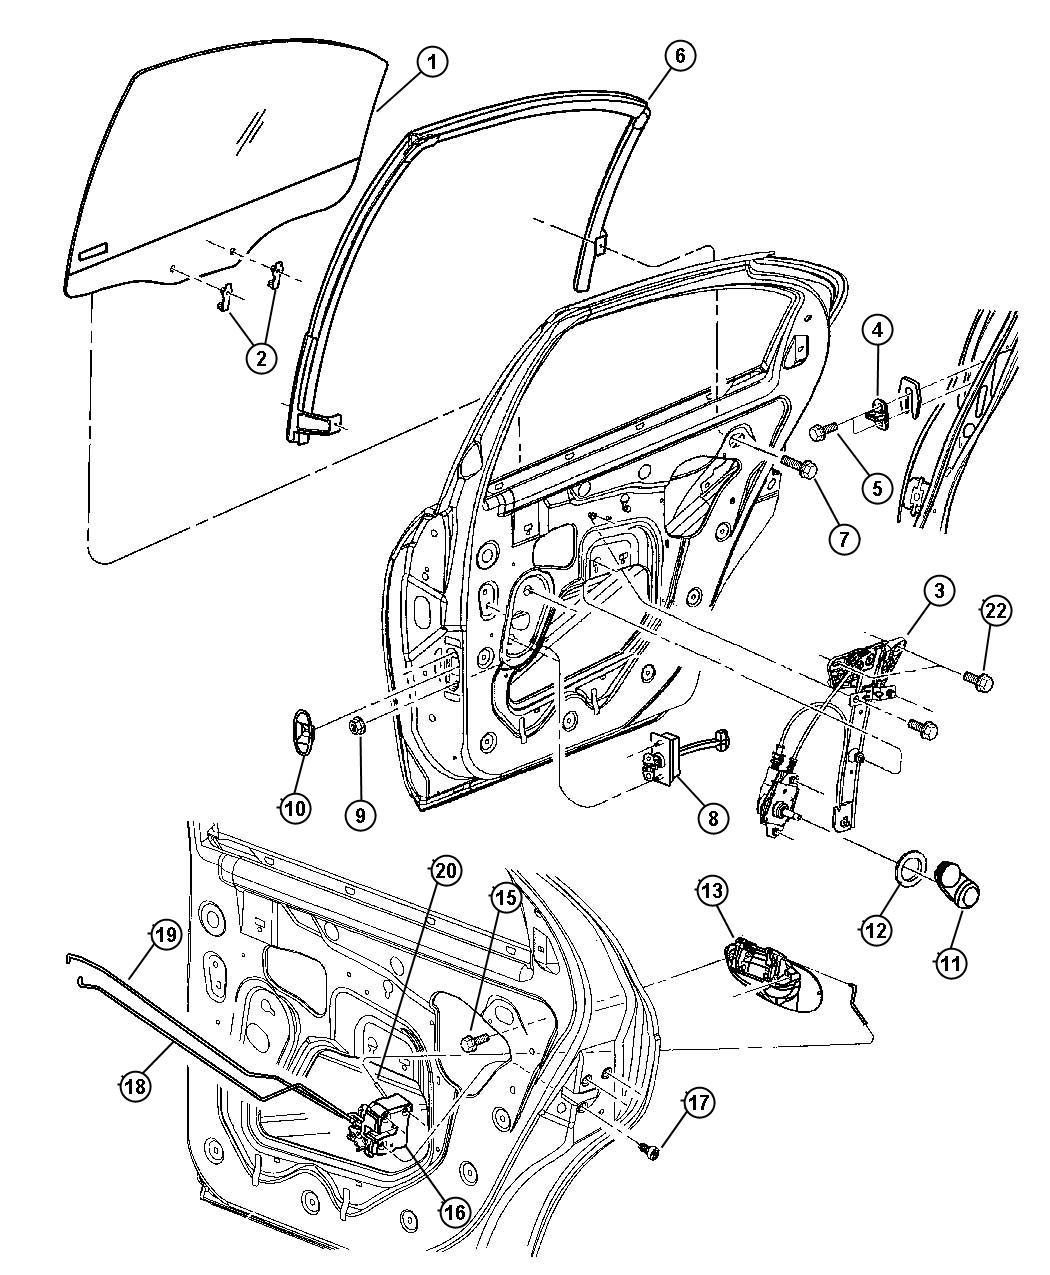 2012 dodge charger latch  left  rear door  manual  locks